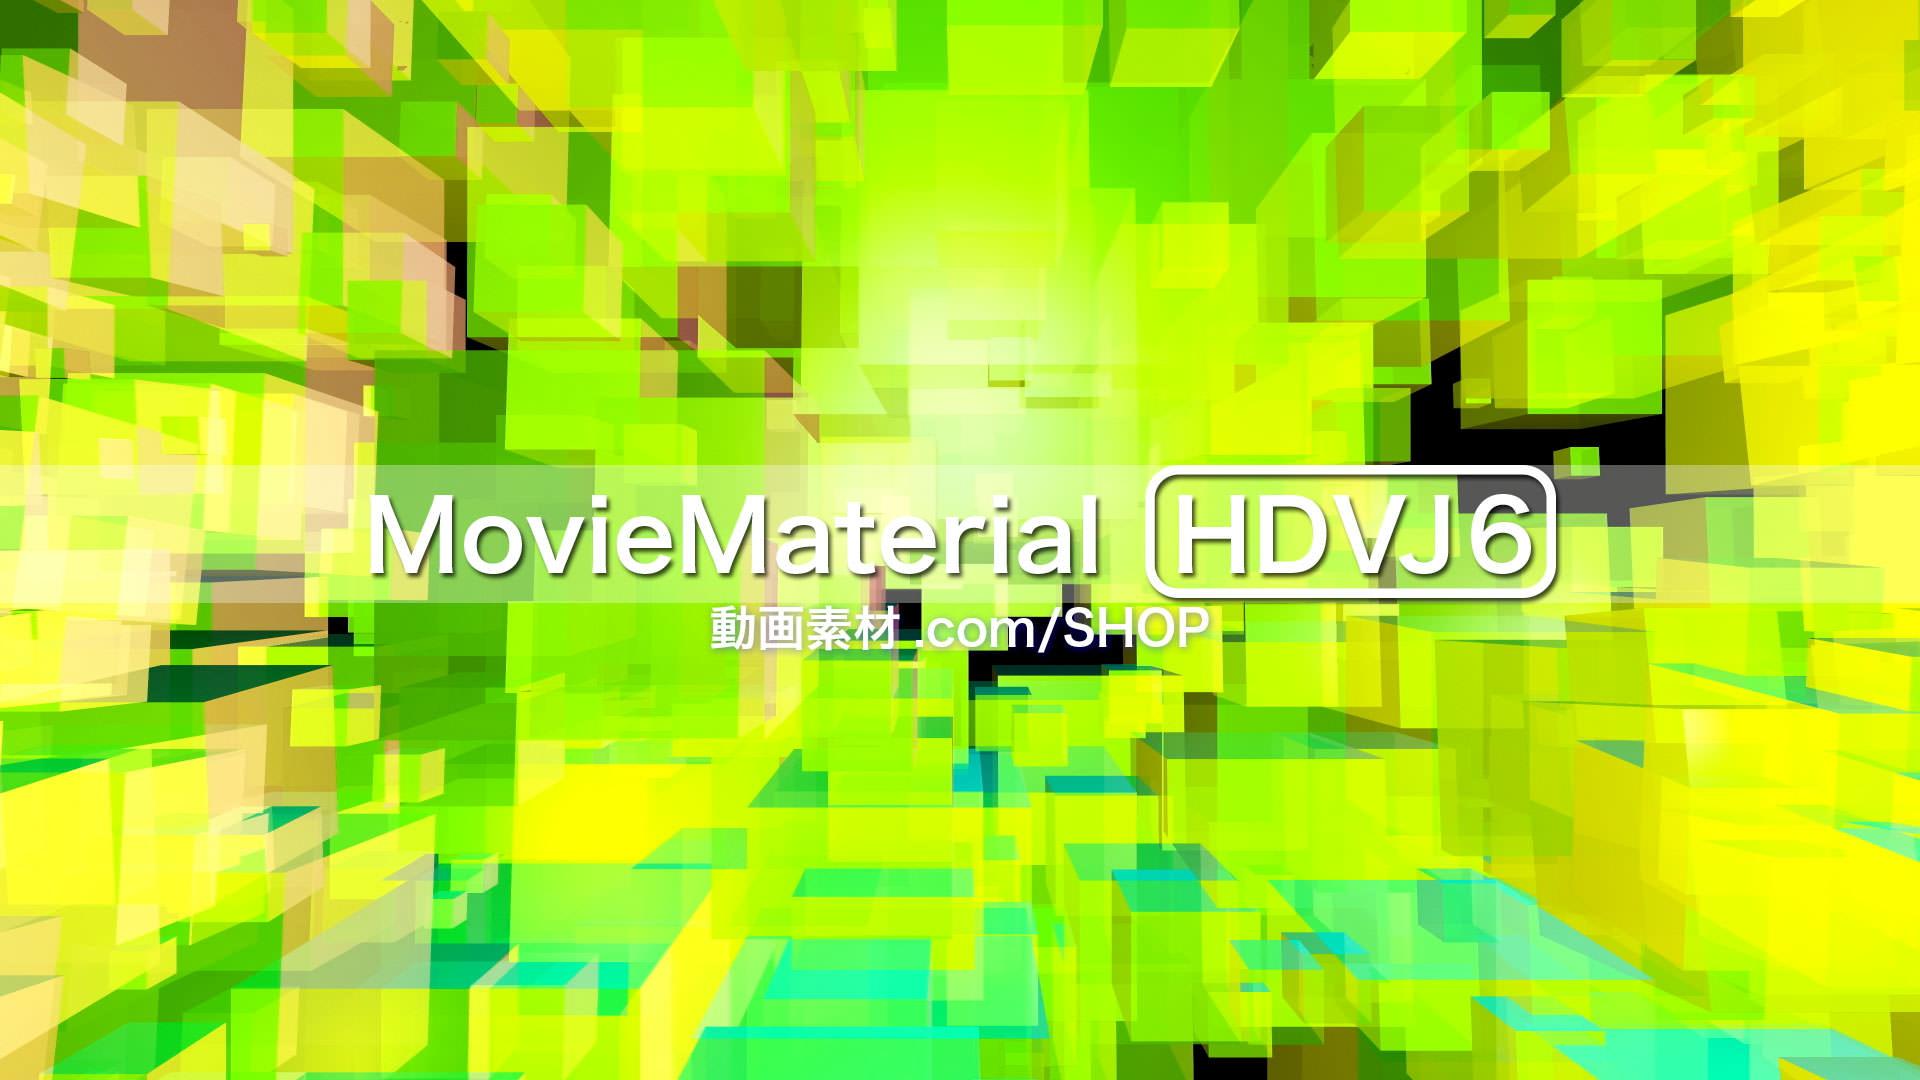 MovieMaterial HDVJ6 フルハイビジョンVJ動画素材集 画像4